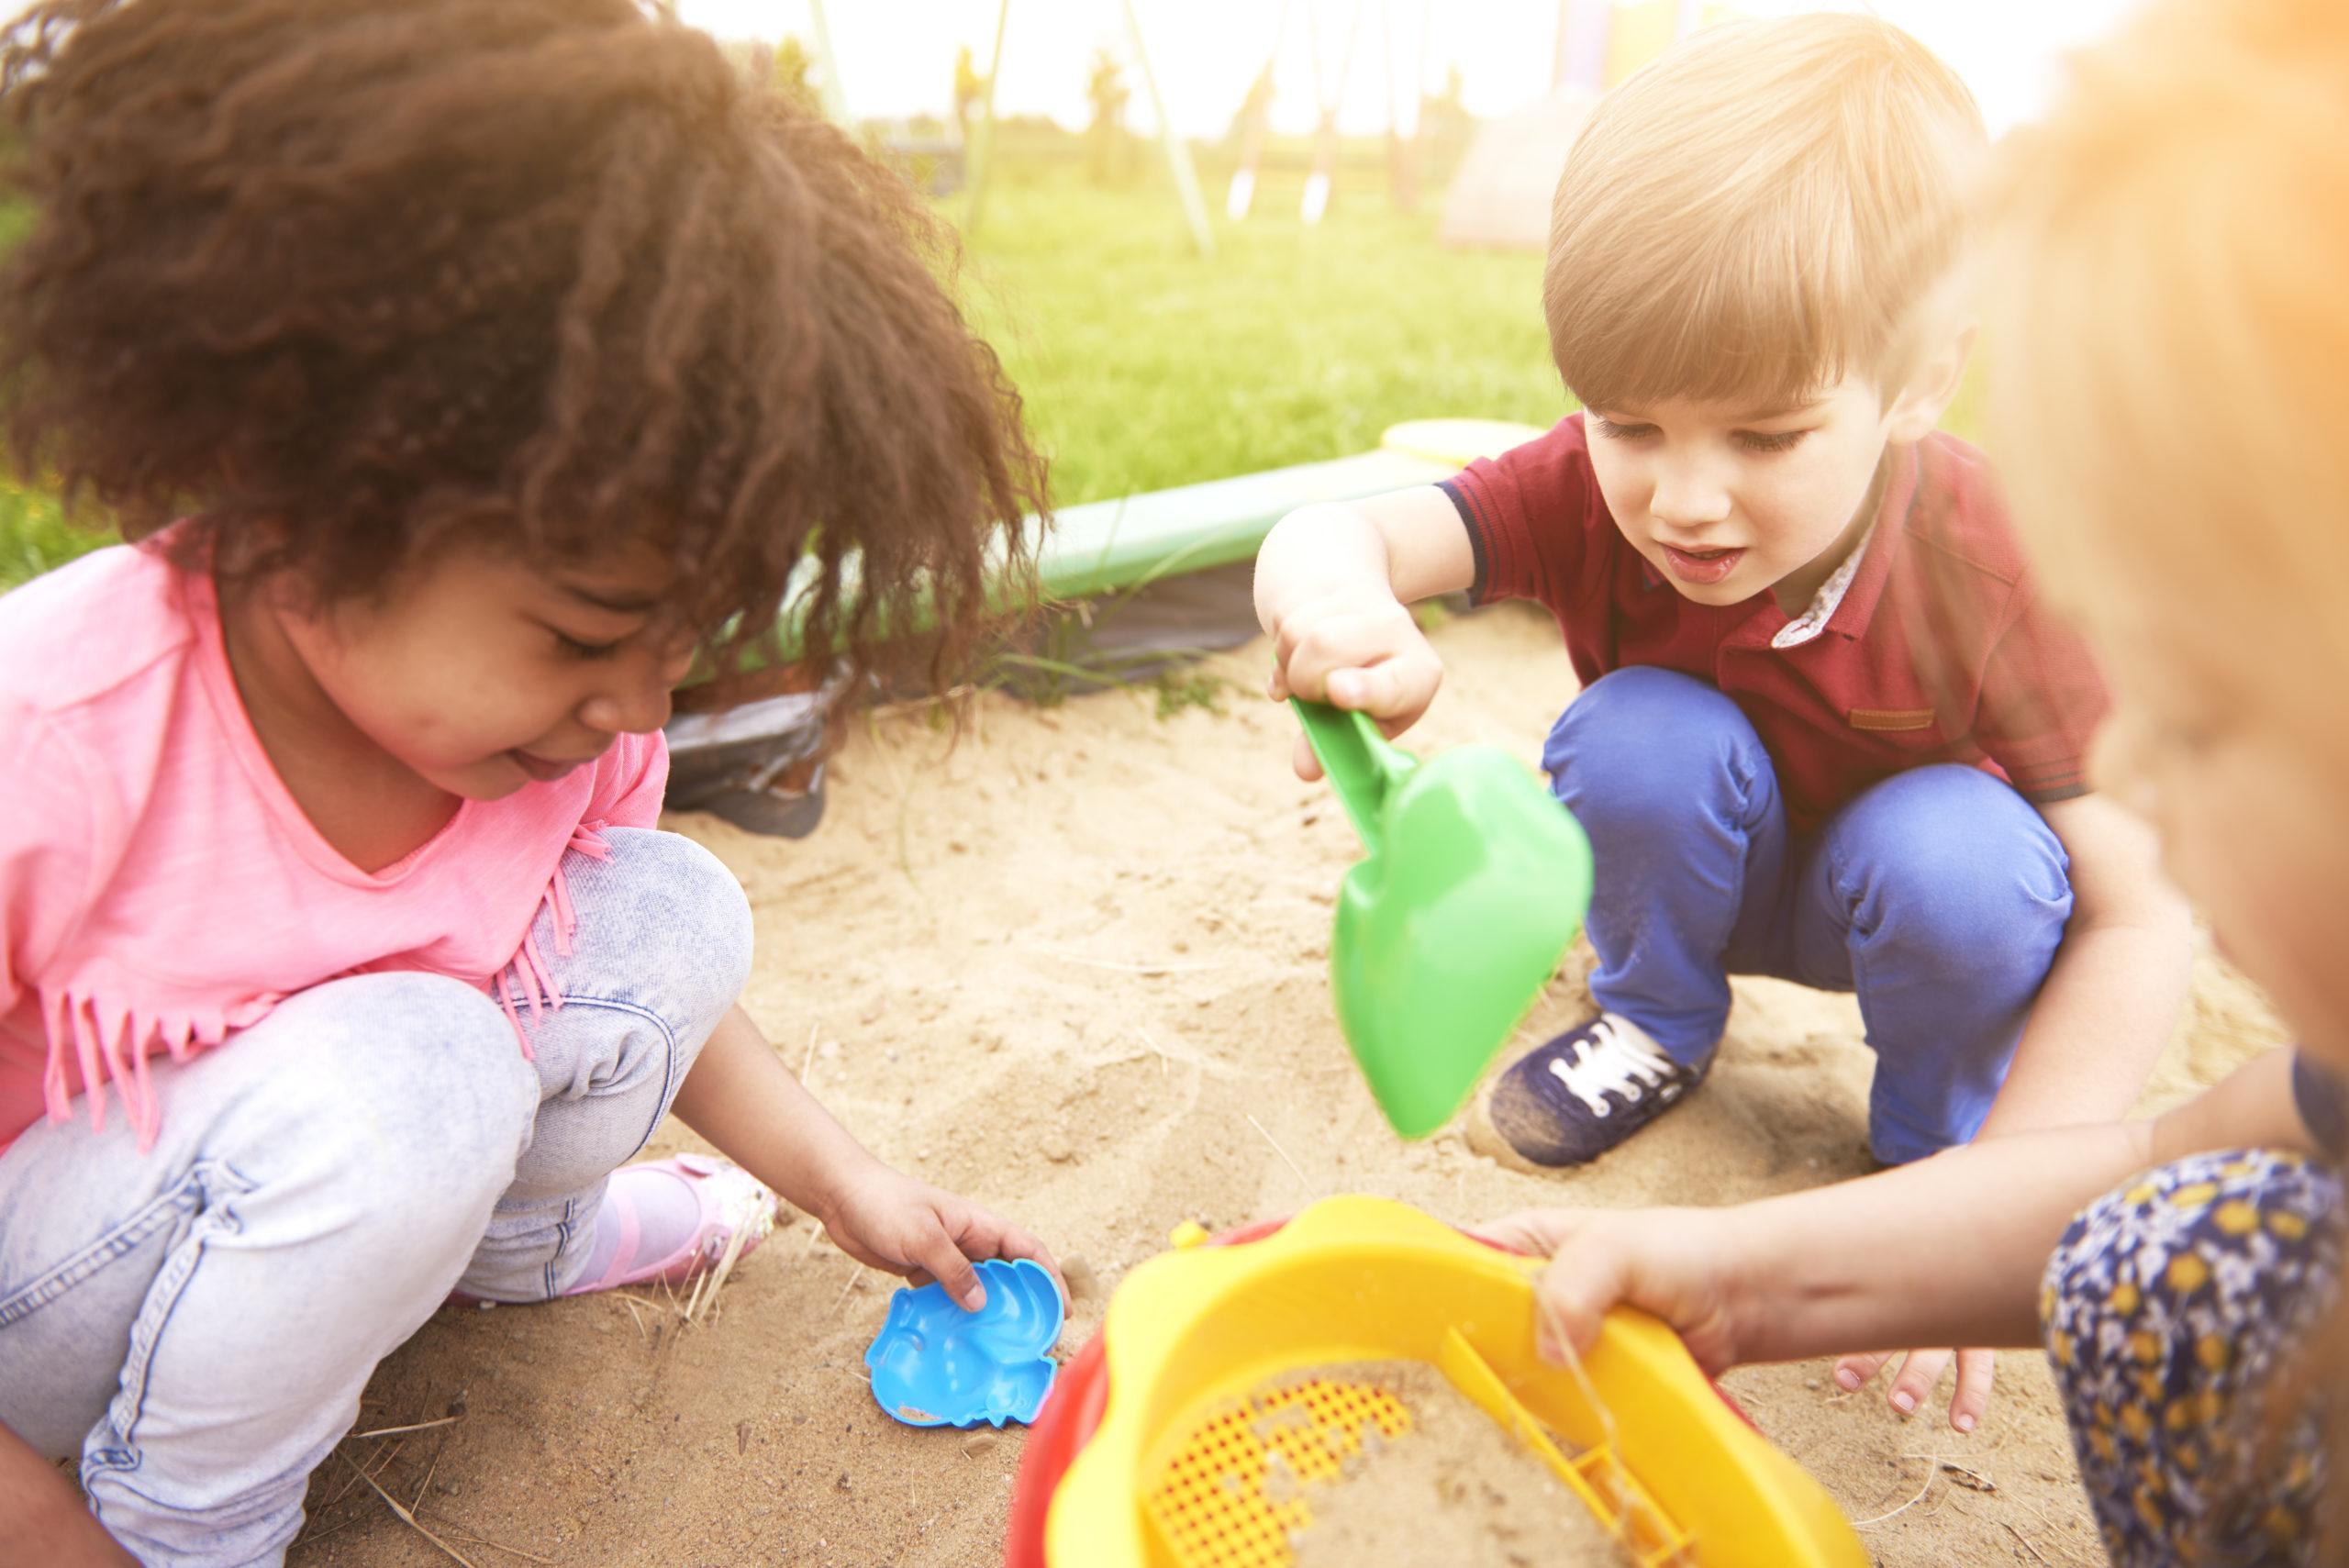 Child Maltreatment Prevention and Surveillance